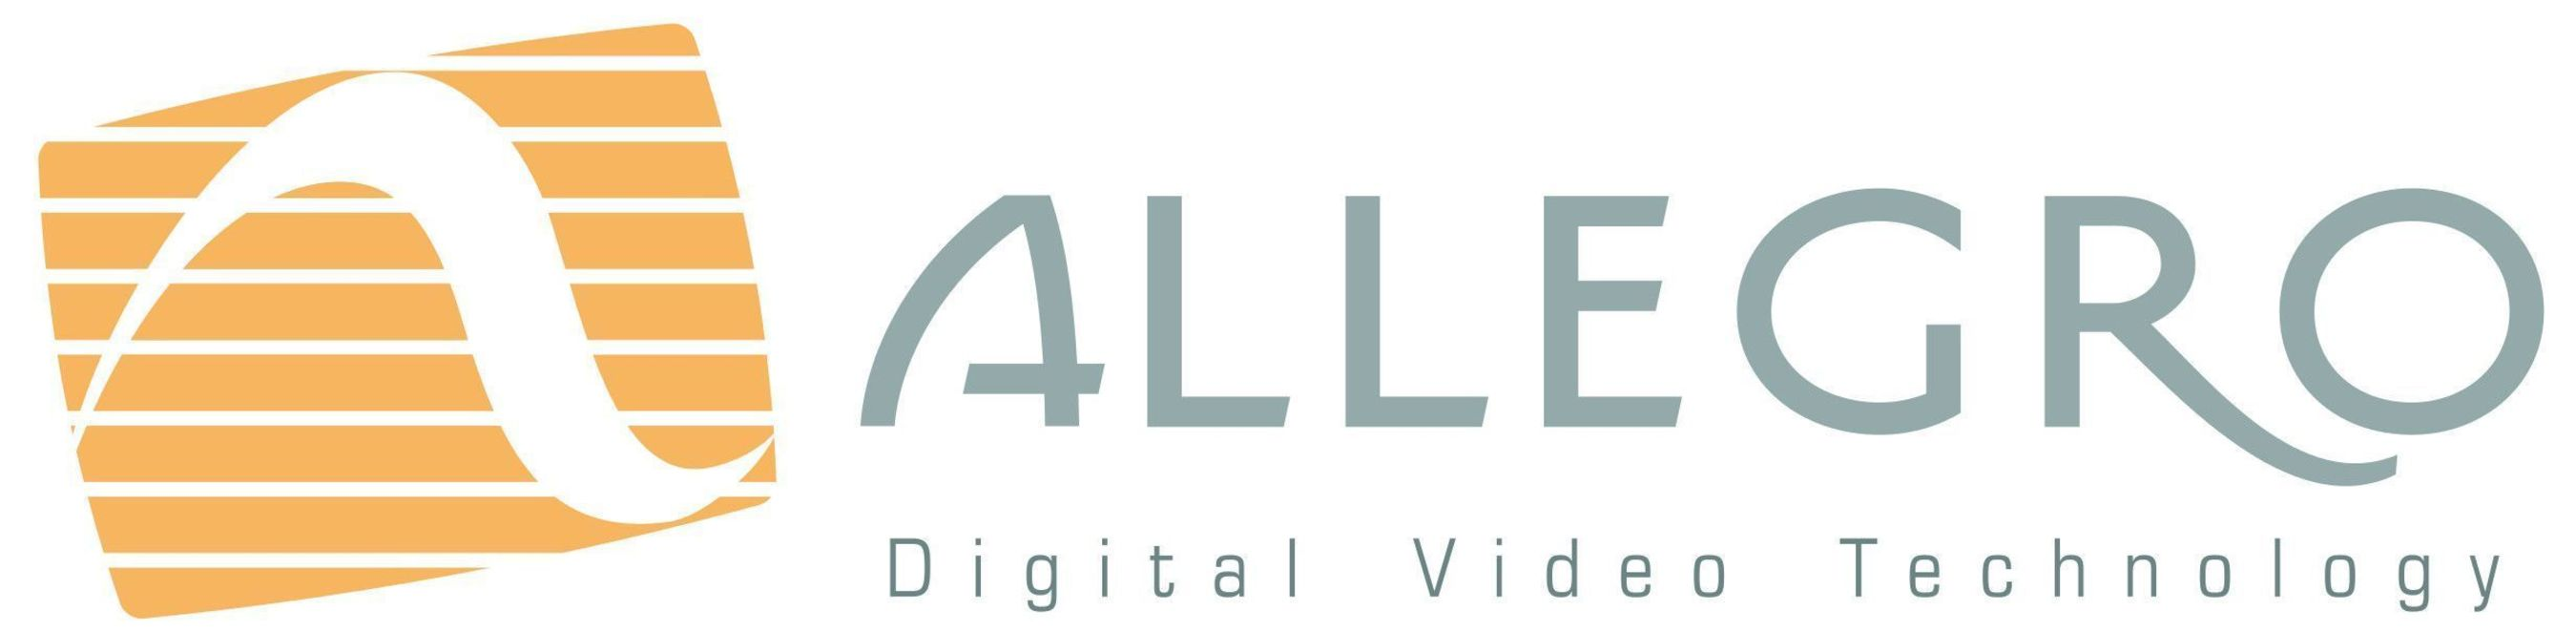 ALLEGRO Digital Video Technology Logo (PRNewsFoto/ALLEGRO DVT)